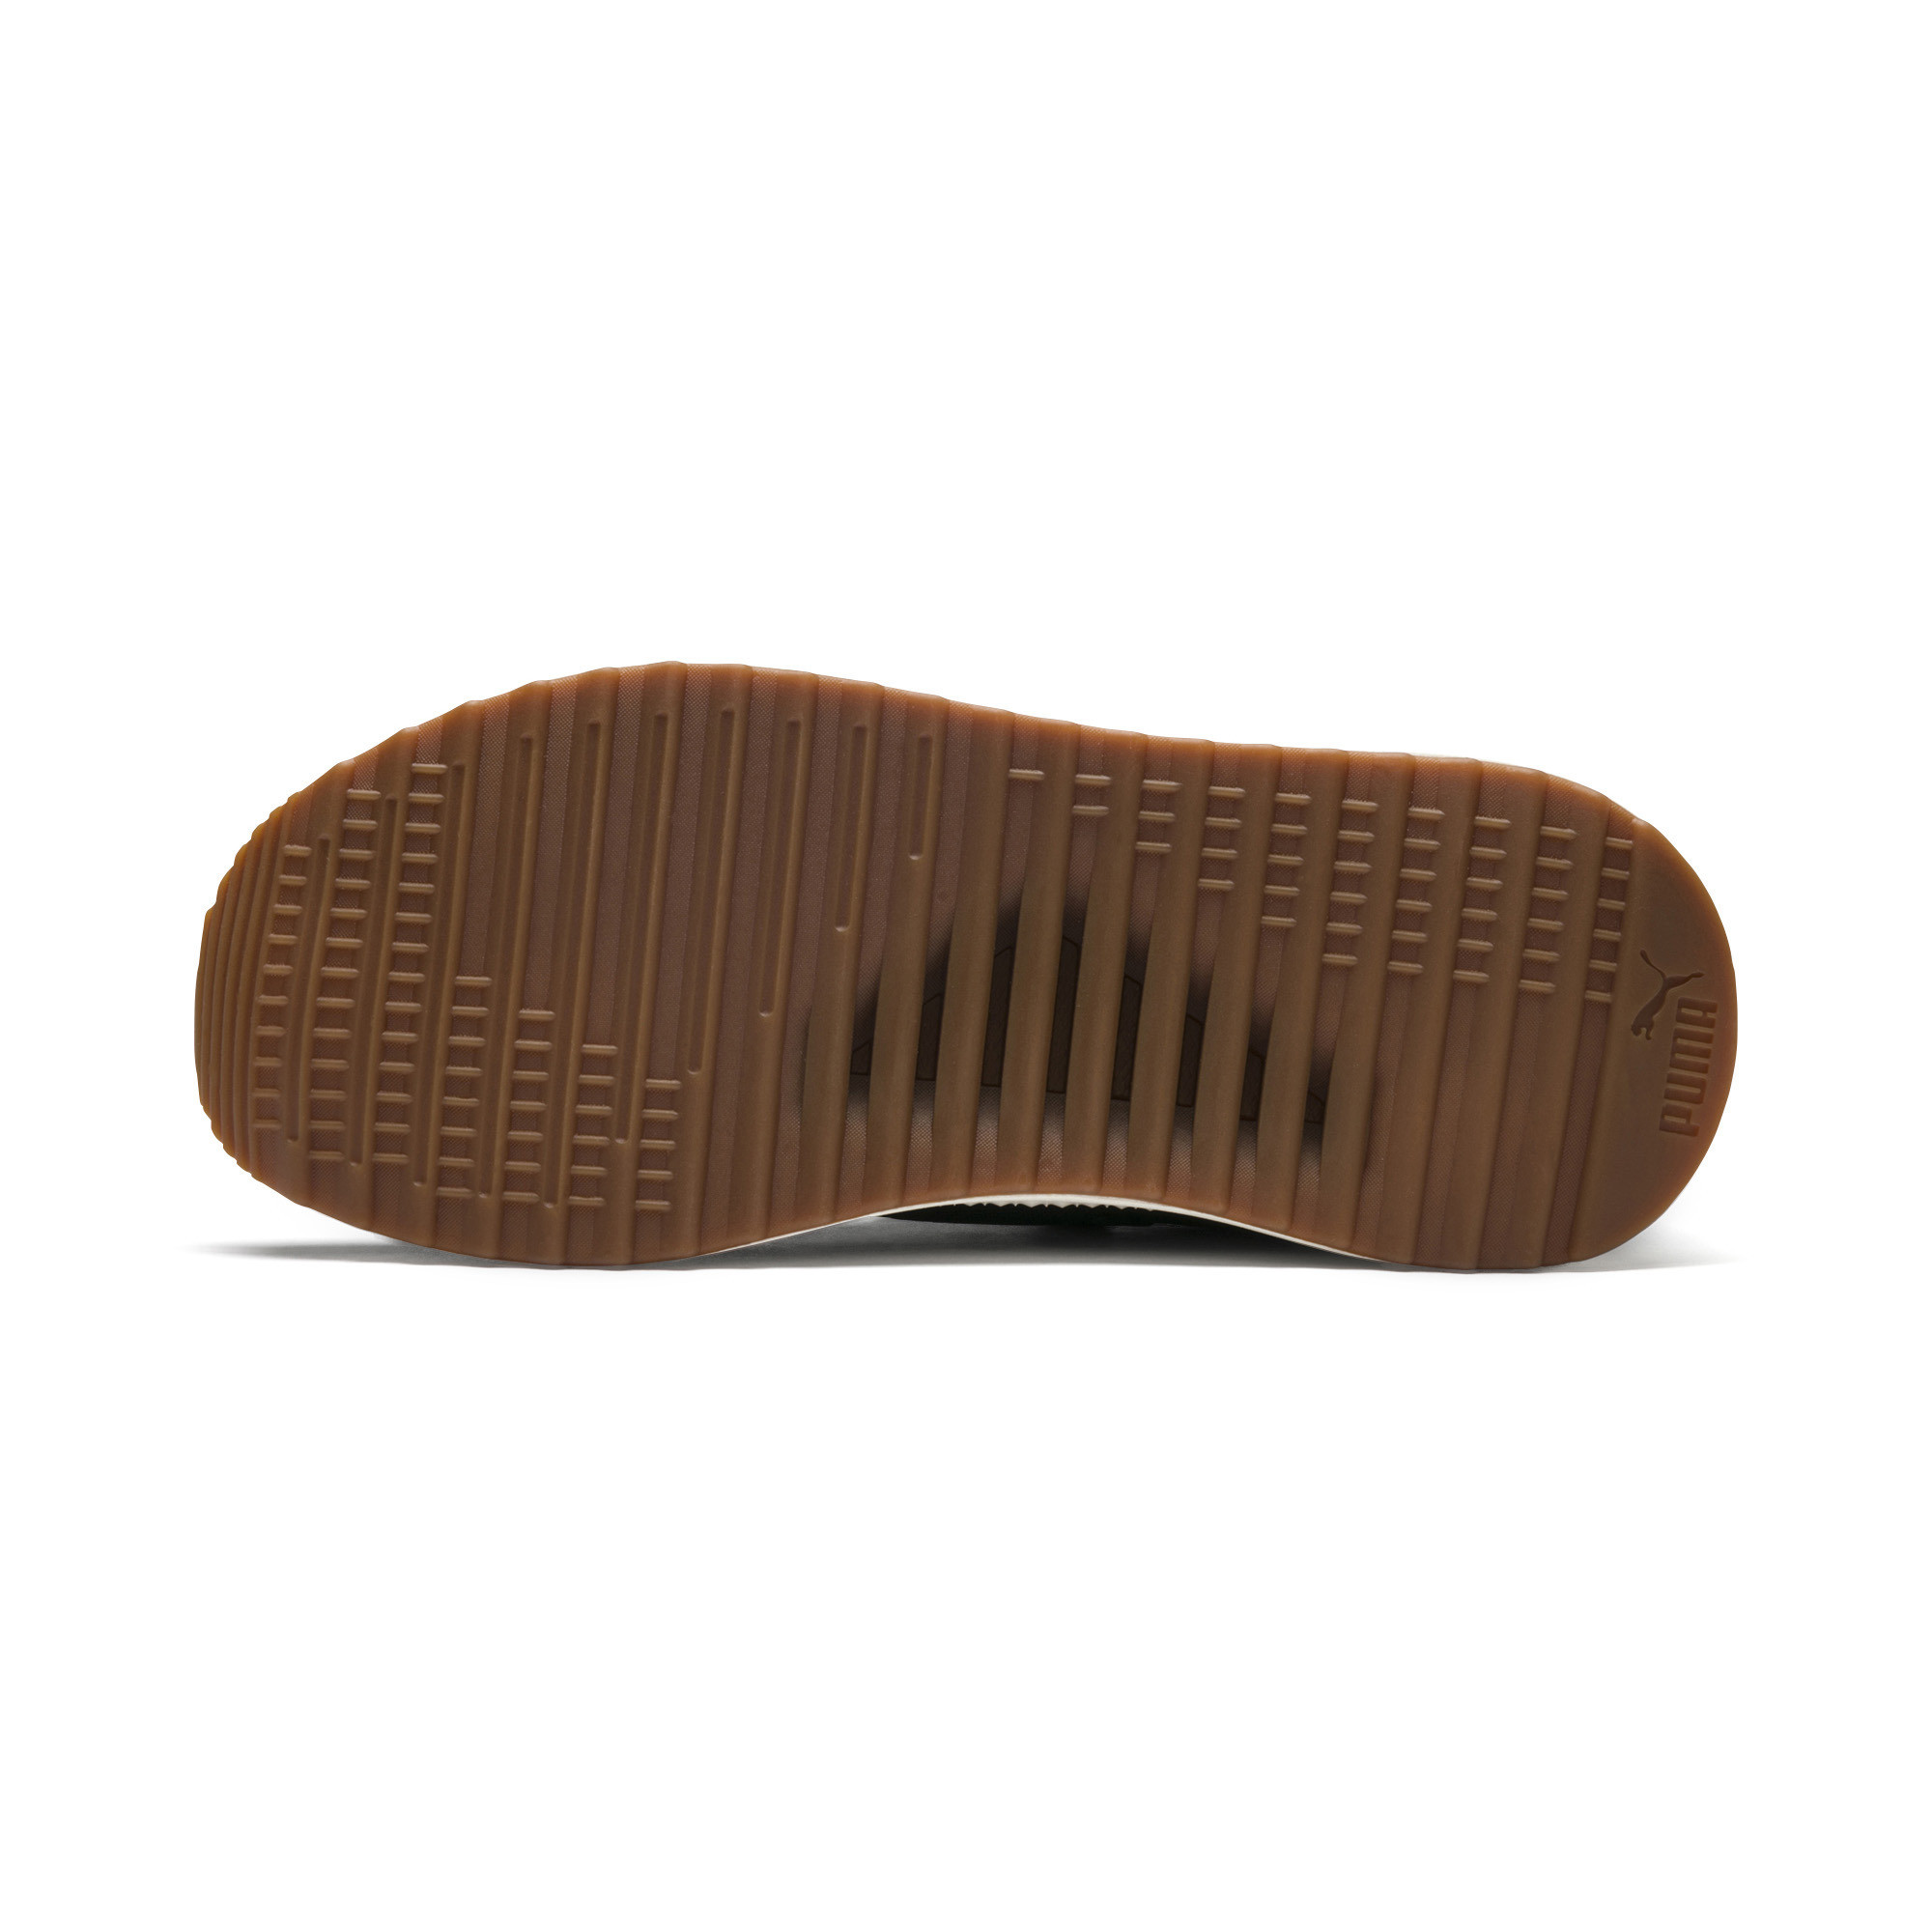 PUMA-Pacer-Next-Cage-Sneakers-Men-Shoe-Basics thumbnail 10